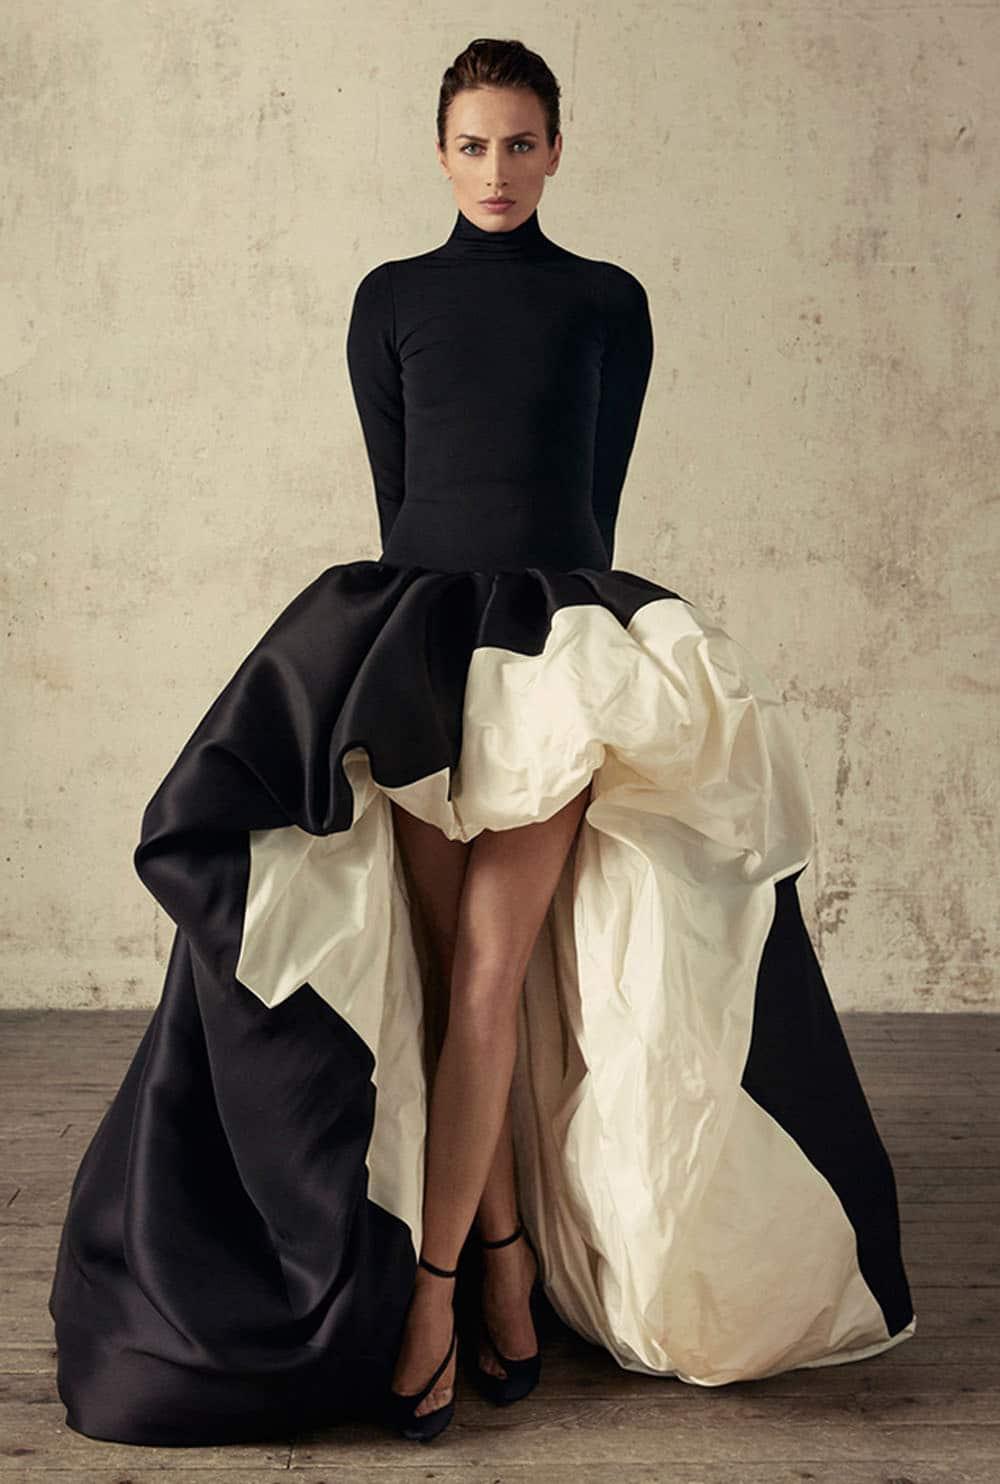 Eniwhere Fashion - S. Rolland 05